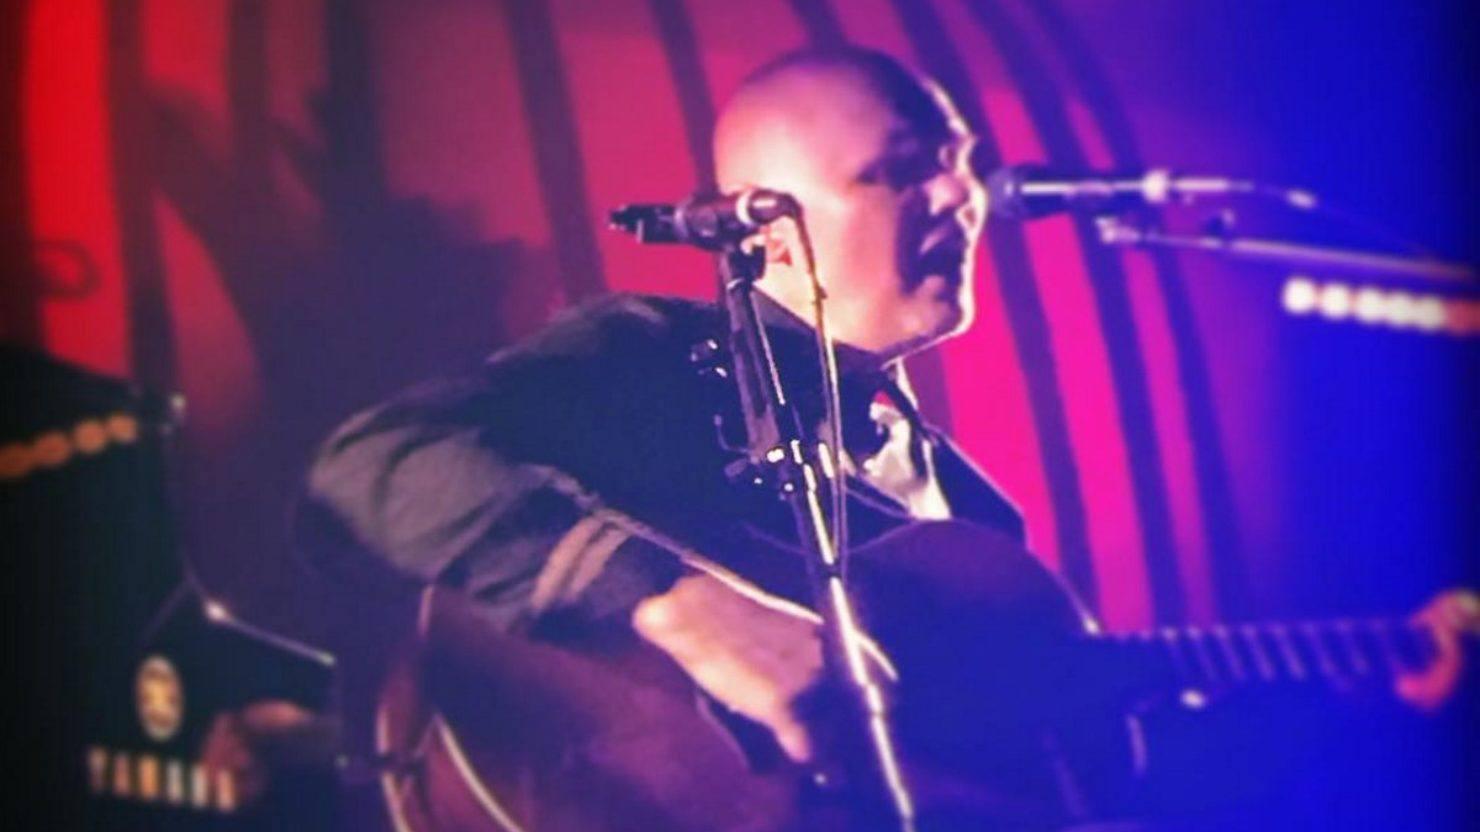 Billy Corgan - Upcoming Shows, Tickets, Reviews, More